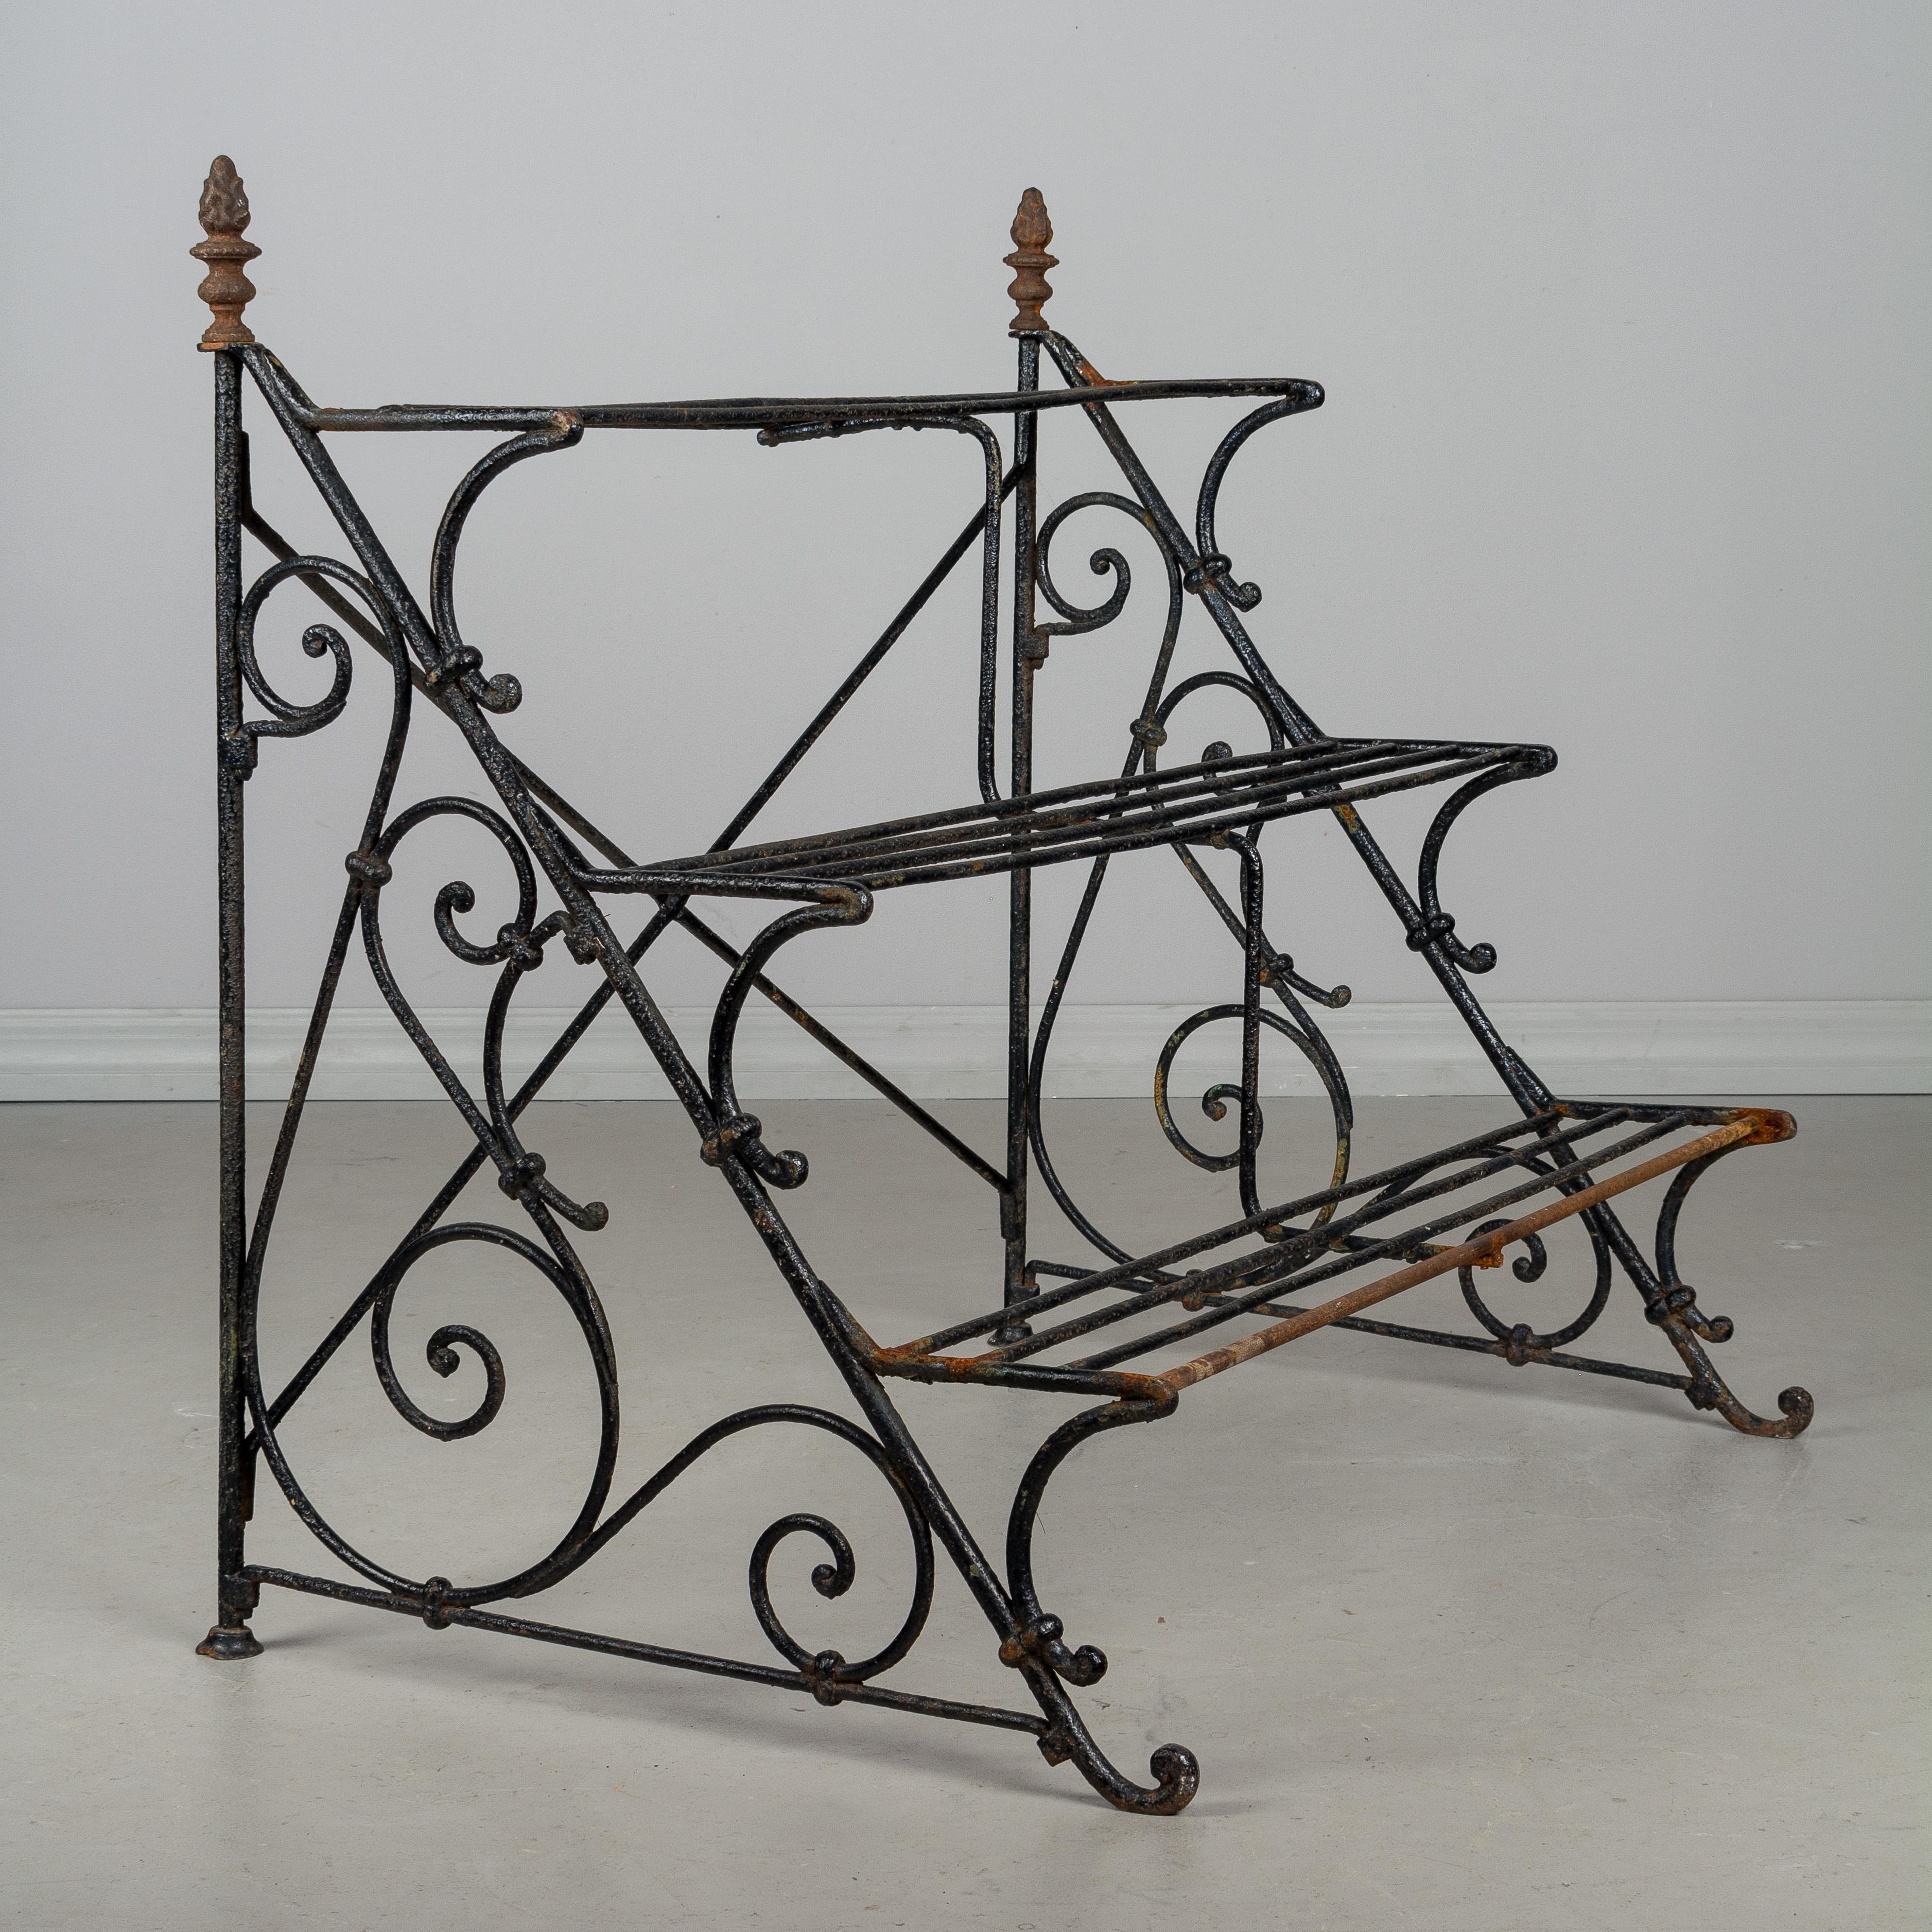 Superieur French Wrought Iron Garden Shelf